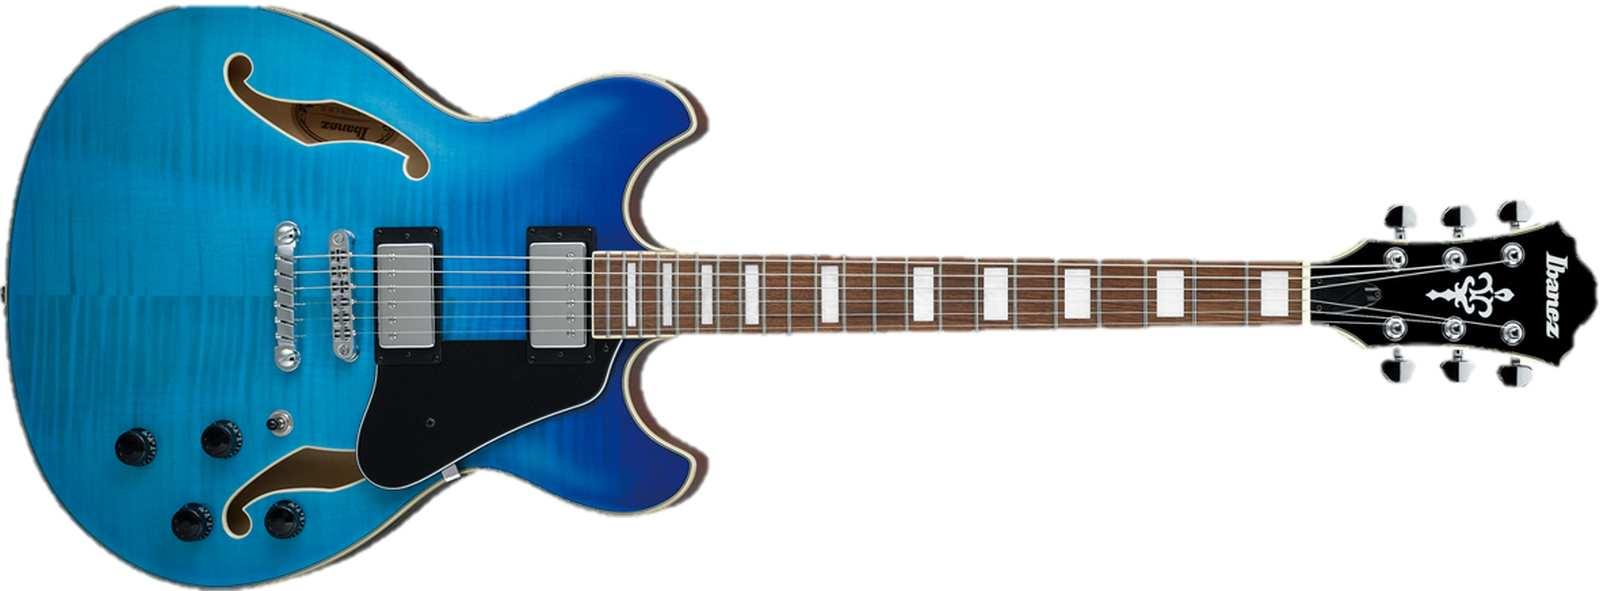 Ibanez AS73FM-AZG E-Gitarre